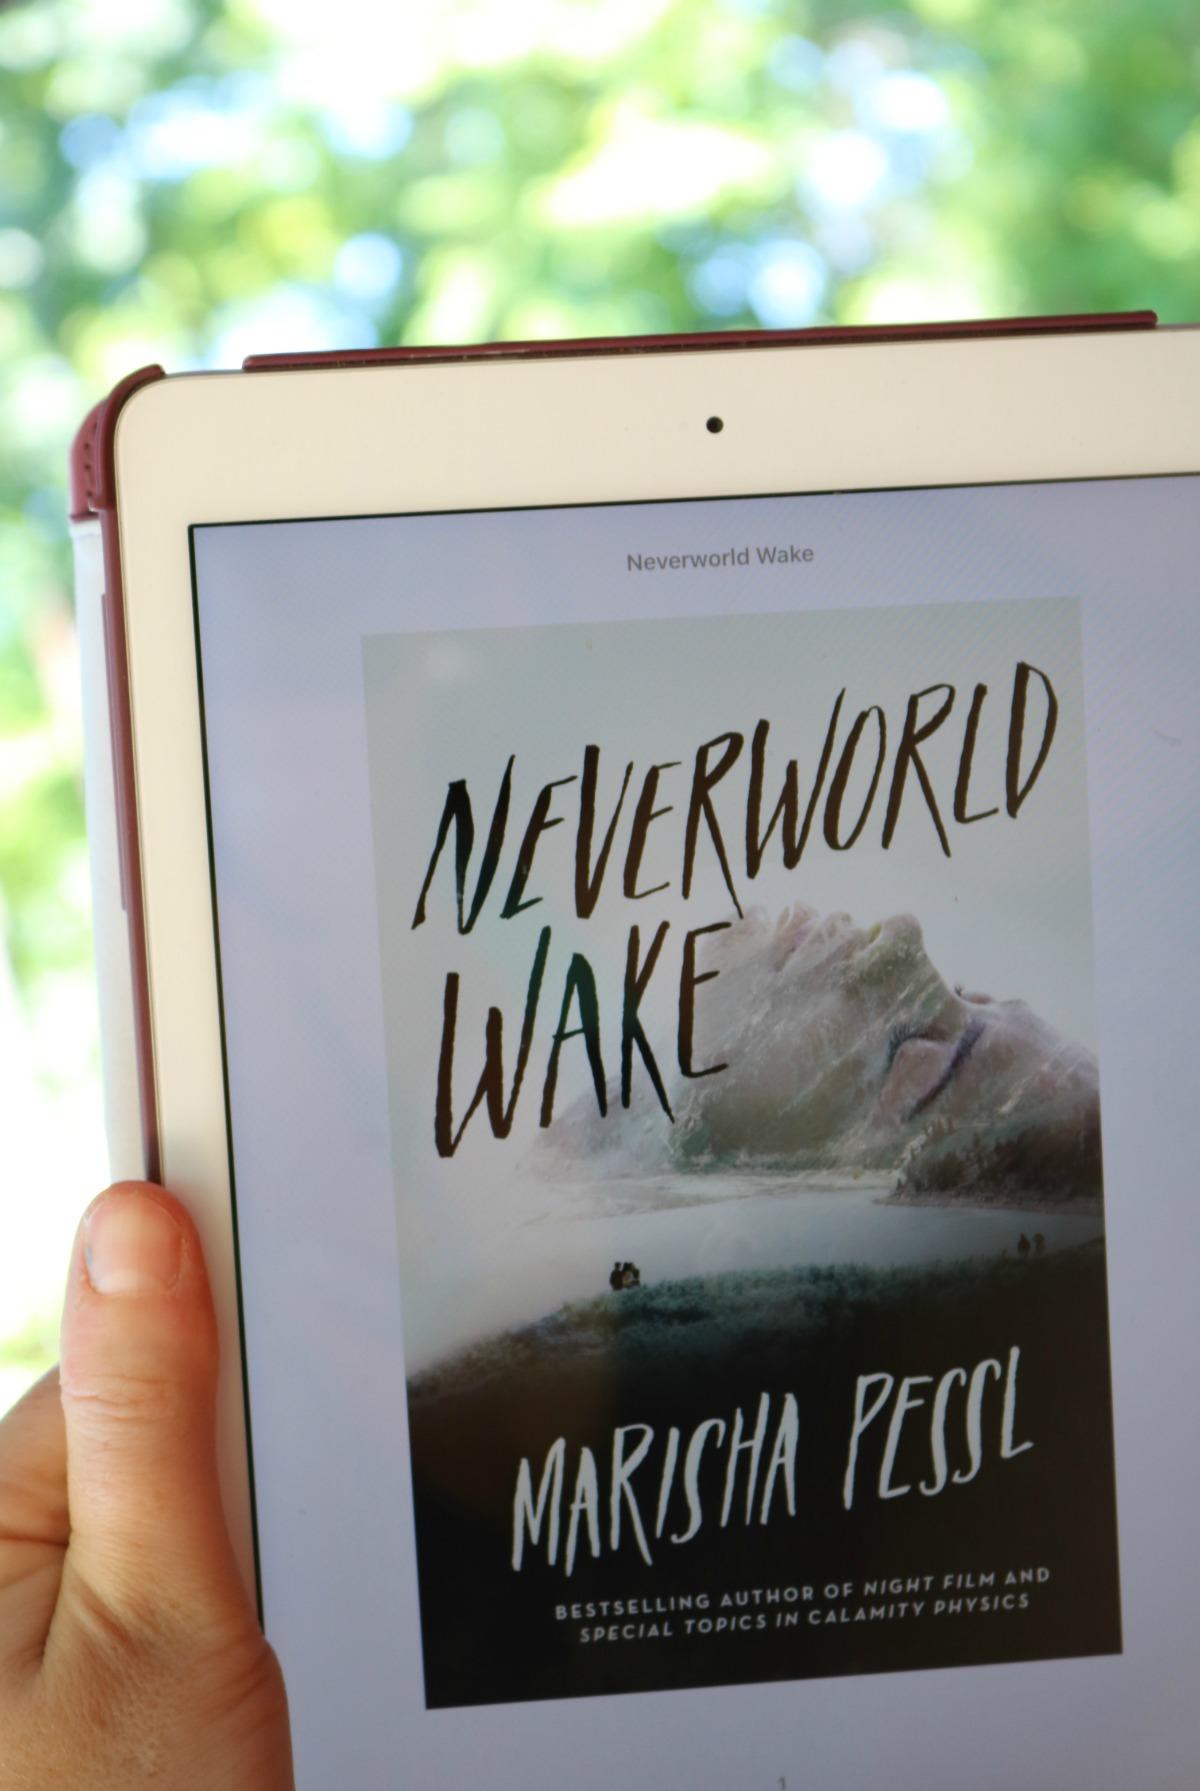 Neverworld Wake by Marisha Pessl Book Review #SummerReading #BookReview